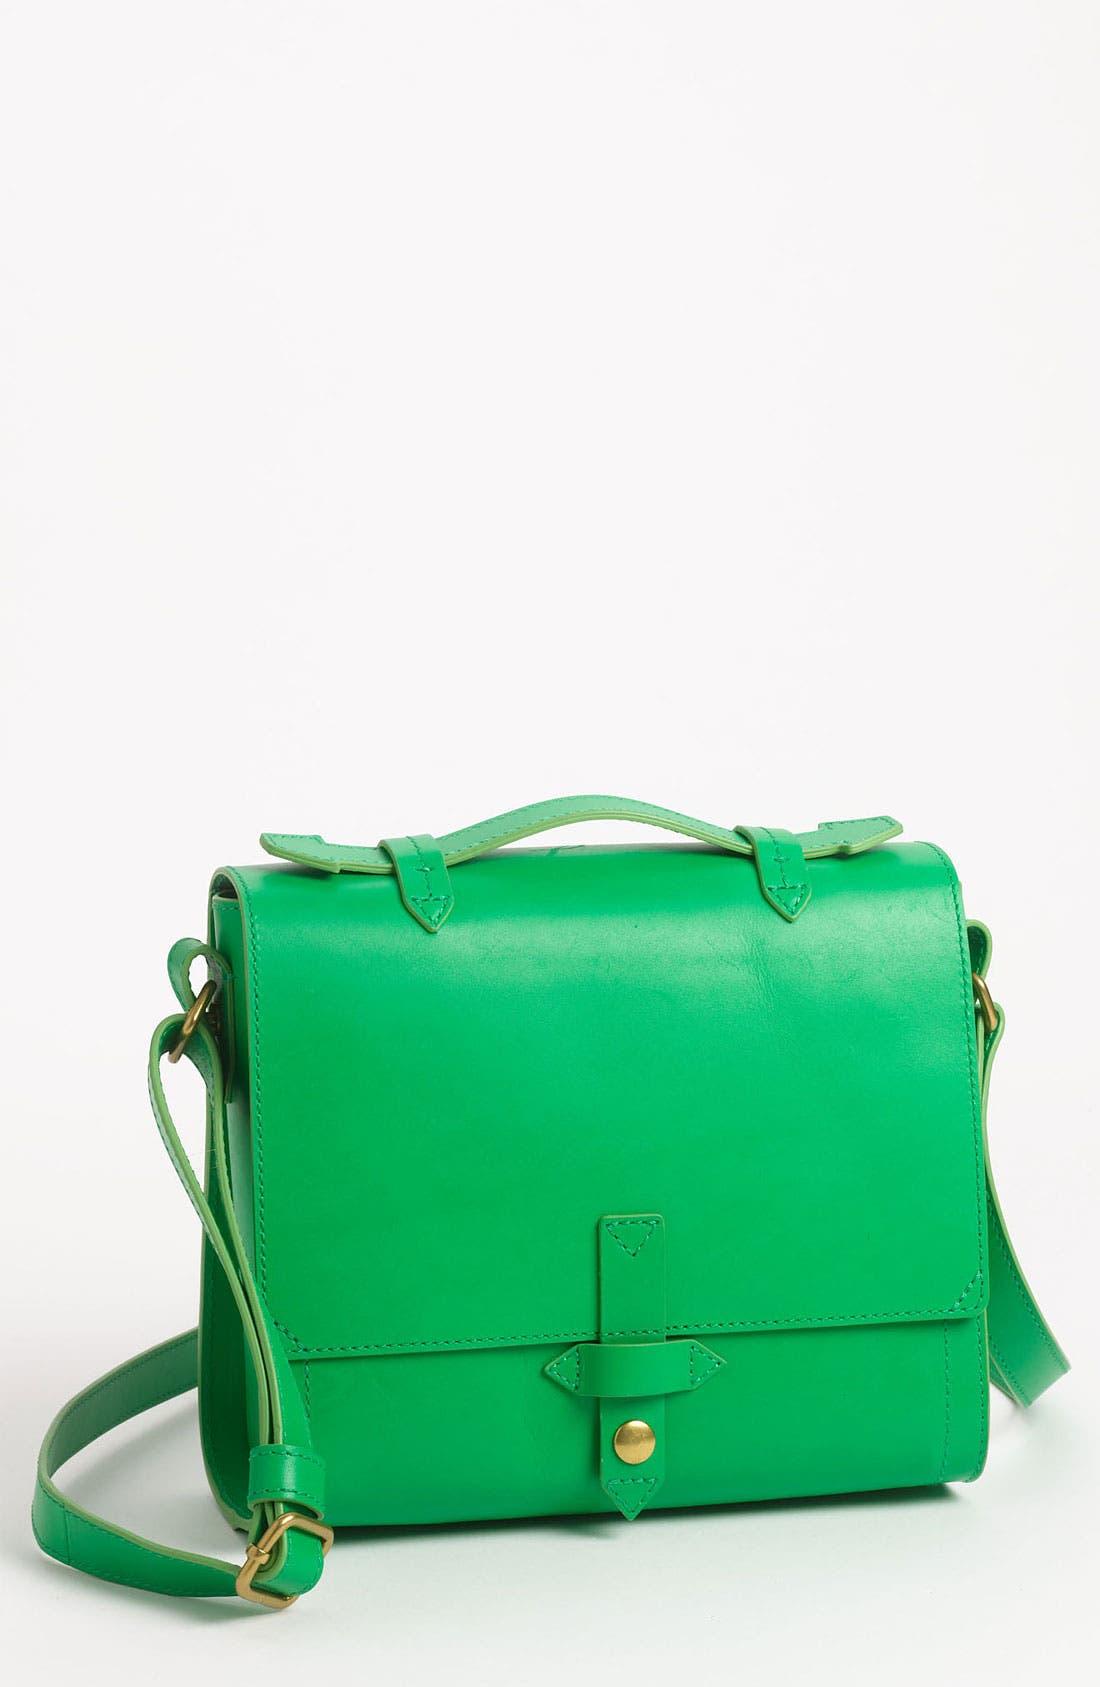 Alternate Image 1 Selected - IIIBeCa by Joy Gryson 'Hudson Street' Crossbody Bag